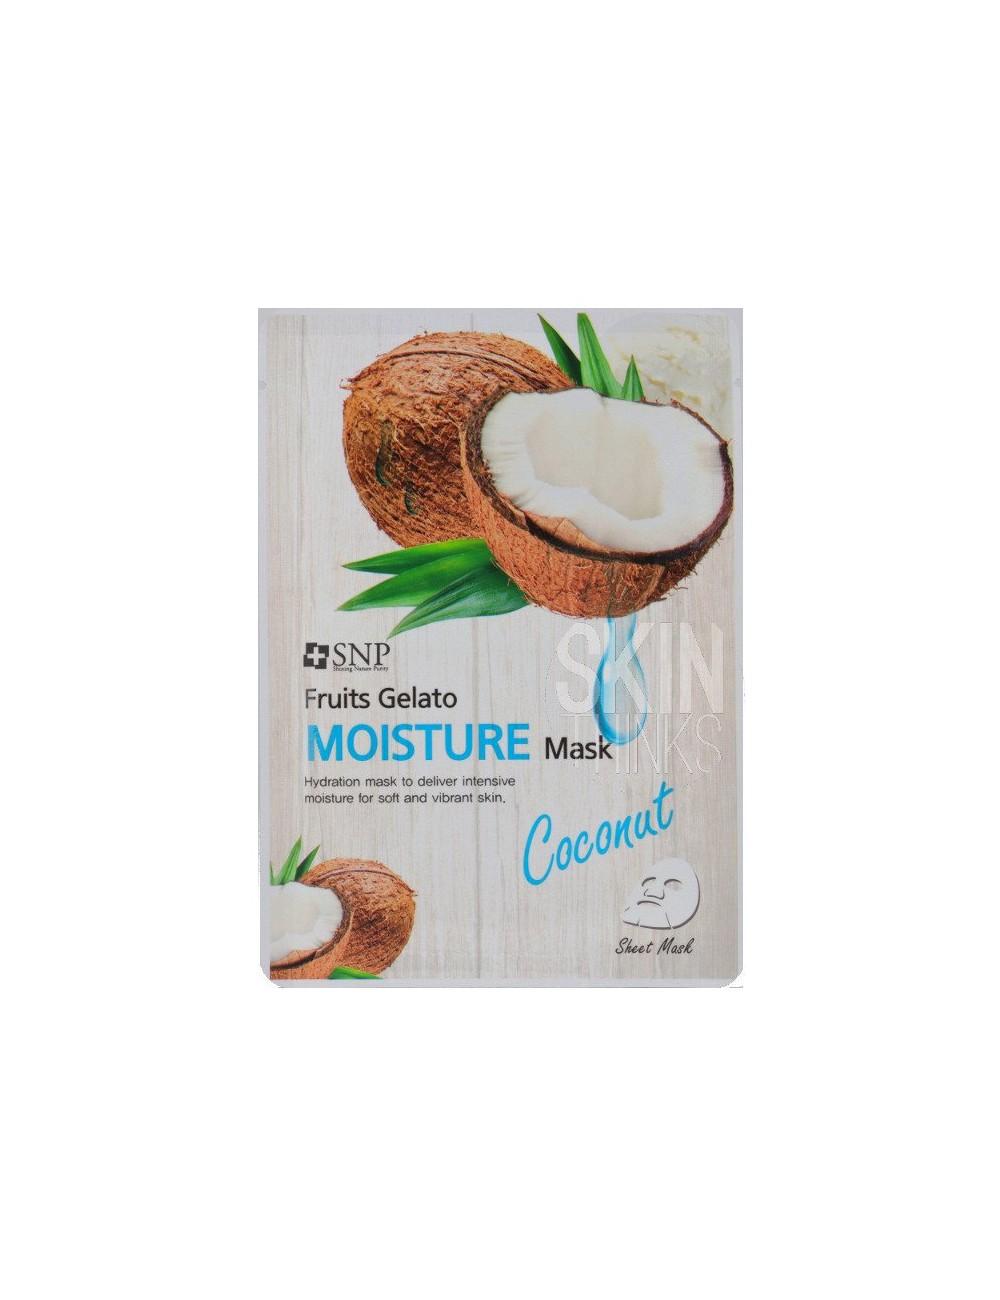 Mascarilla Hidratante SNP Fruits Gelato Moisture Mask